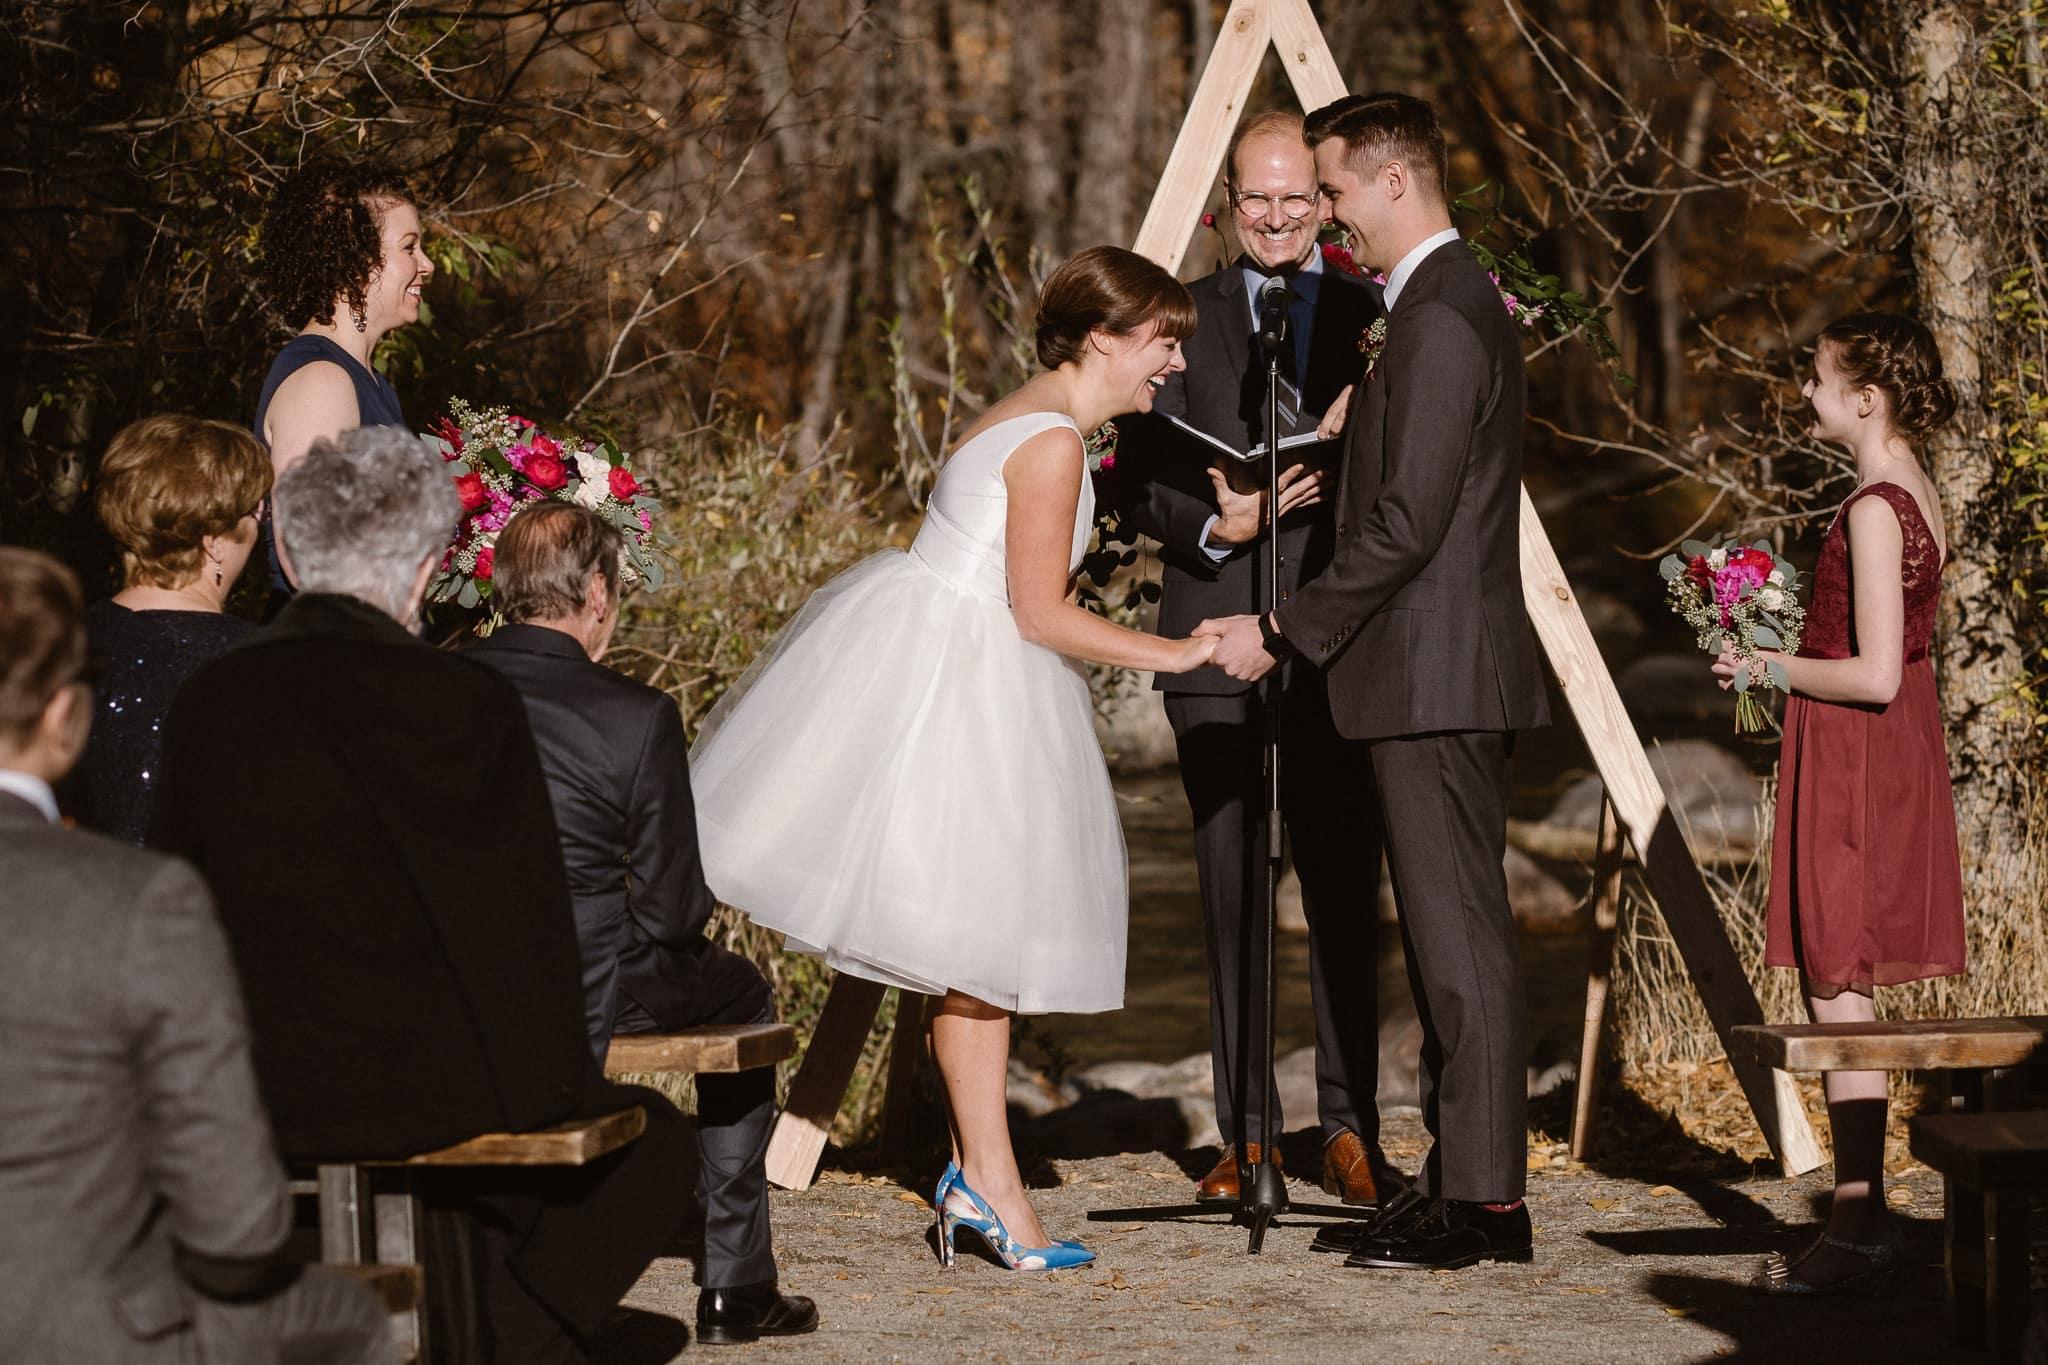 Silverthorne Pavilion wedding ceremony, Colorado wedding photographer, outdoor wedding ceremony, Colorado mountain wedding venues